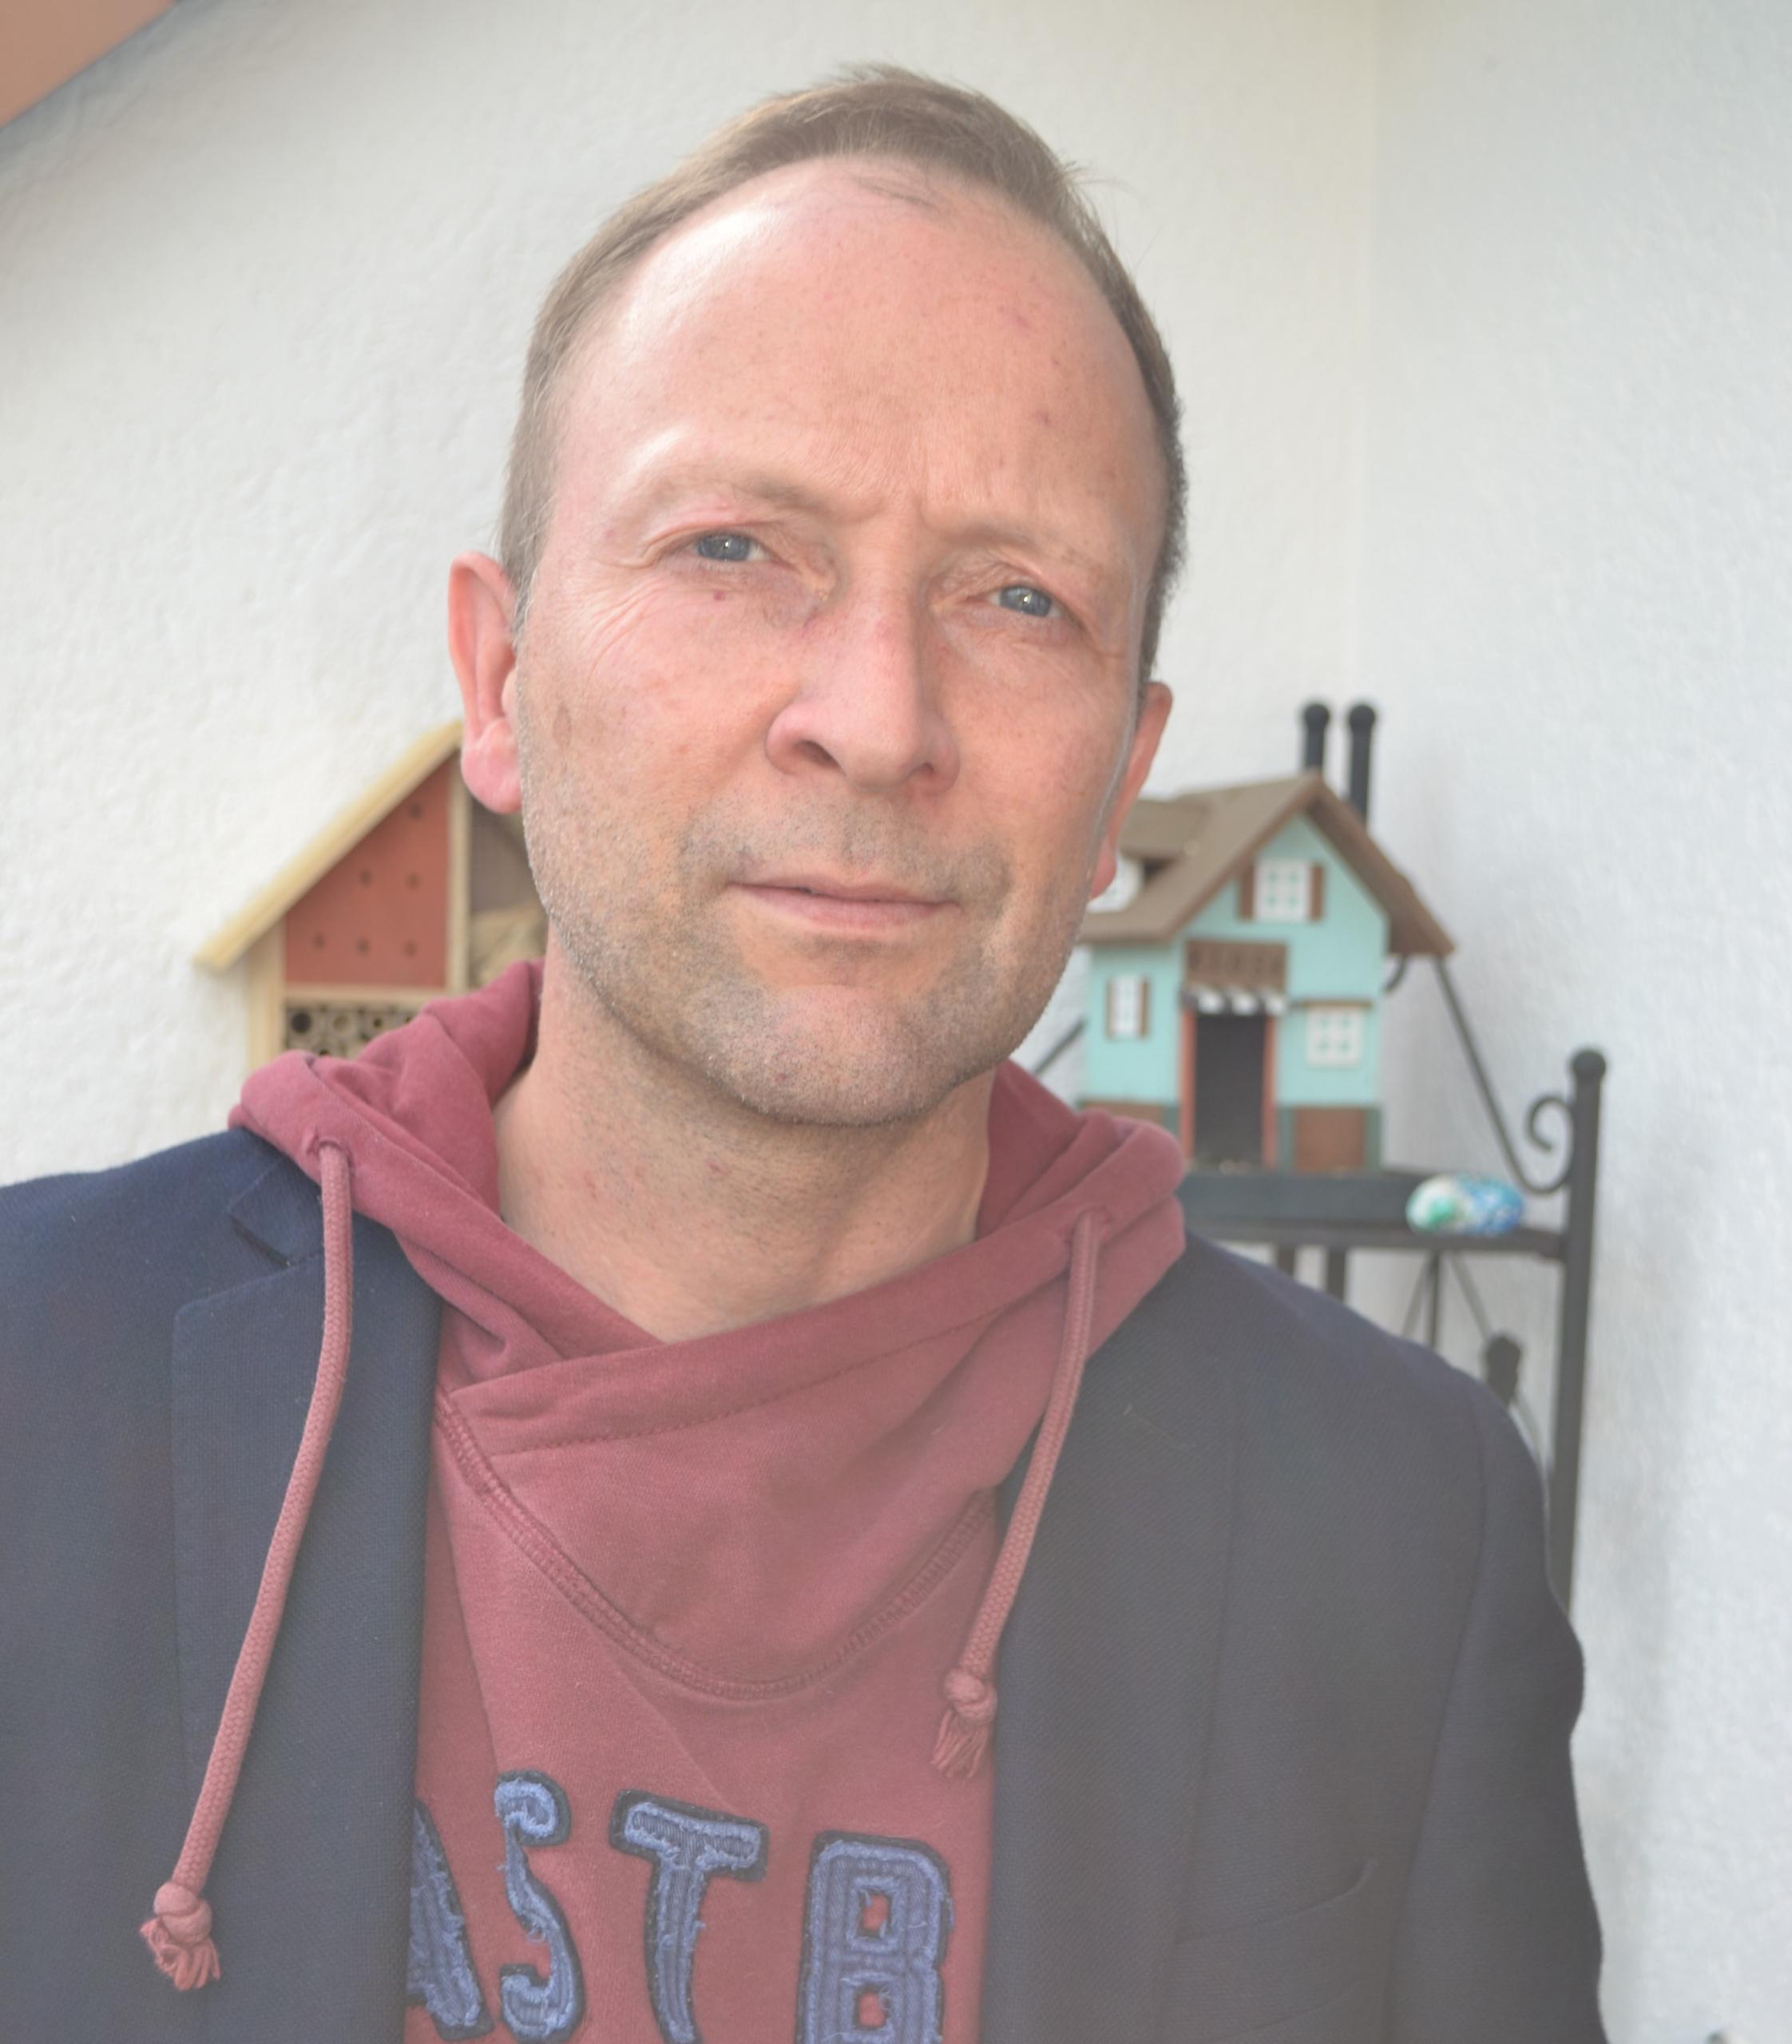 Holger Kairies